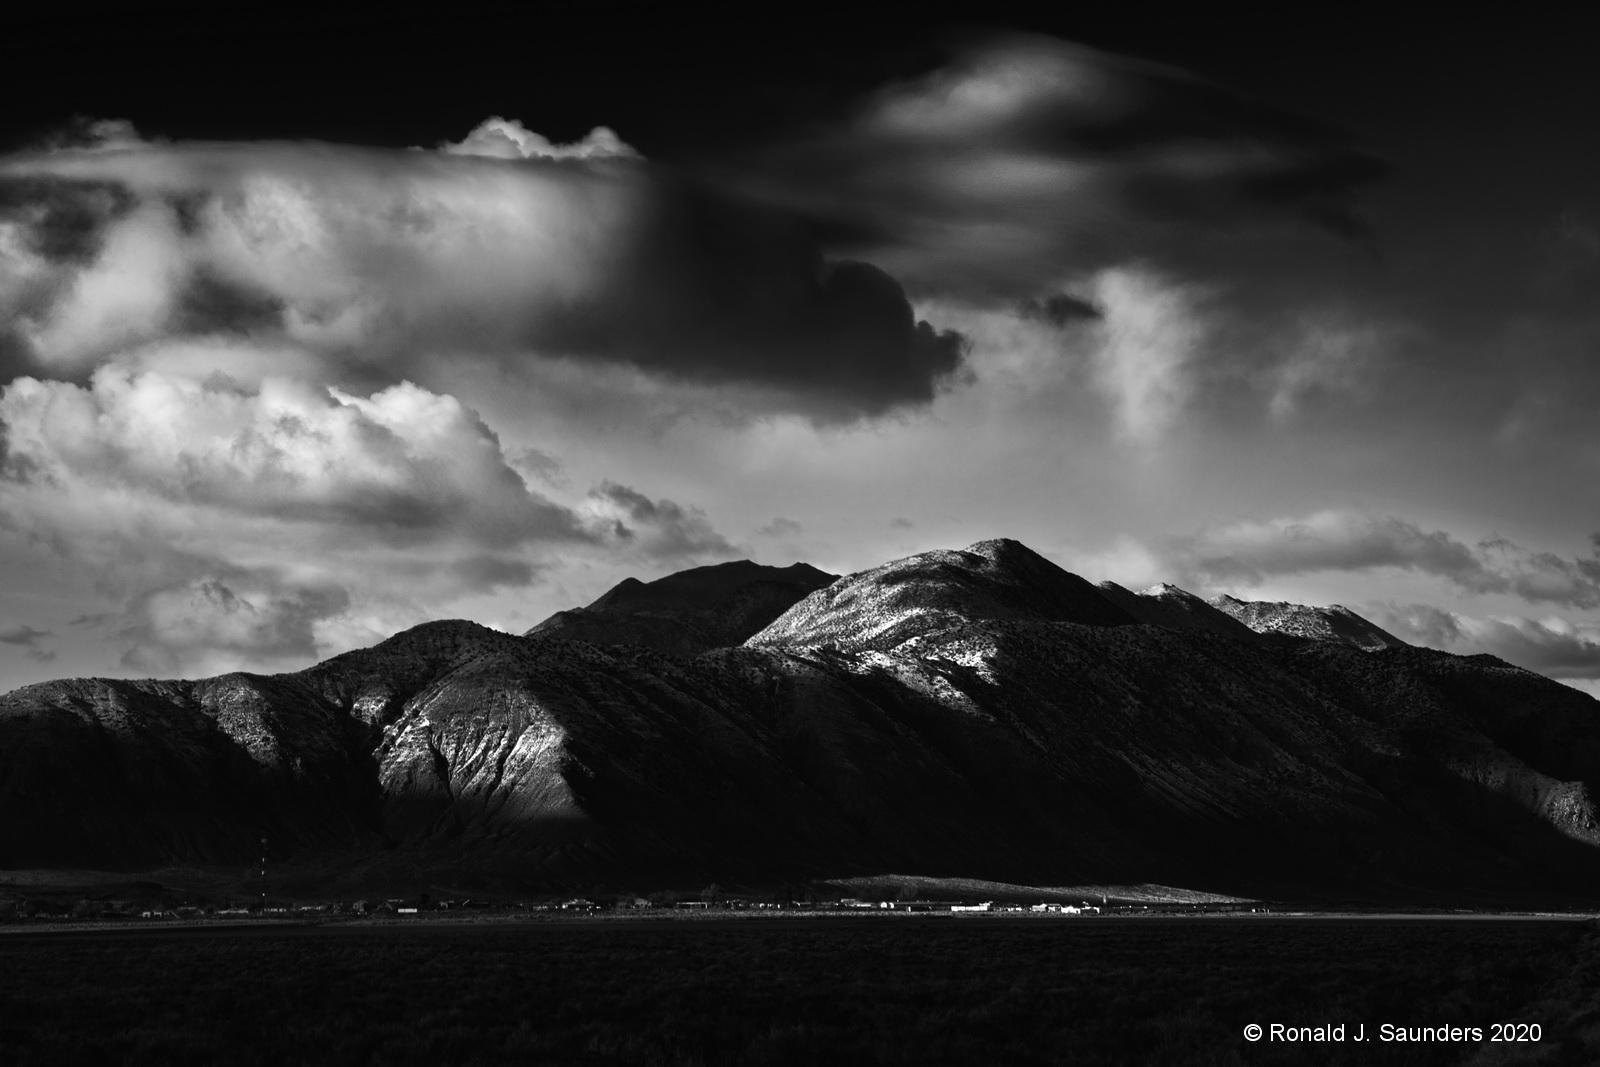 gerlach, nevada, black rock, desert, best image, saunders, ronald,  burning man, granite, granite peak, landscape best of, image, photograph, photo